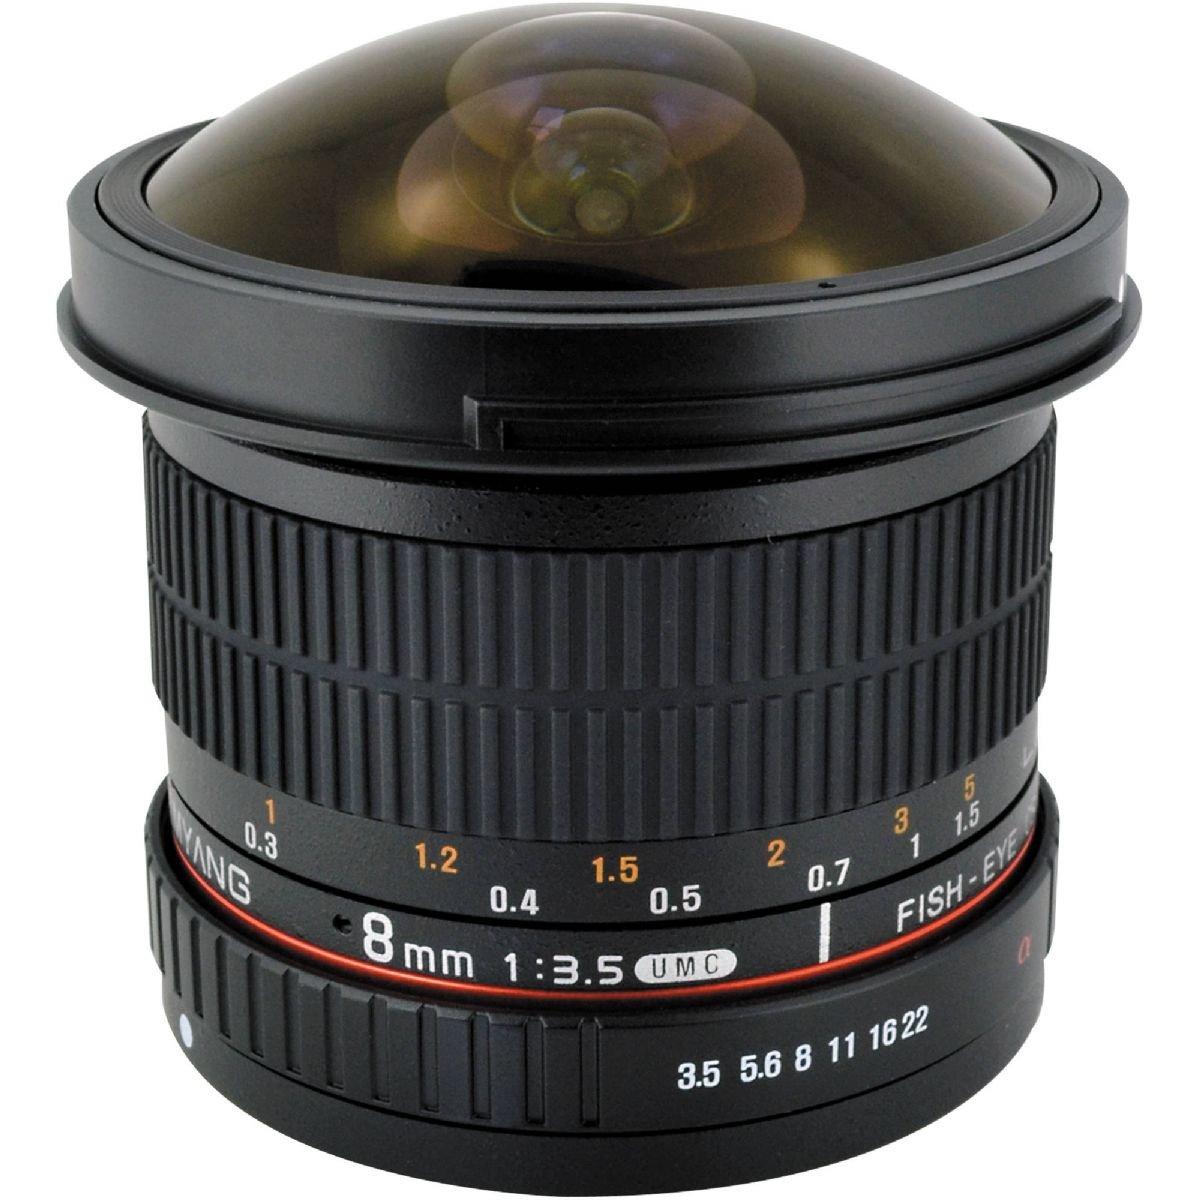 SAMYANG 8 mm f/3,5 UMC Fish-eye CS II pro MFT